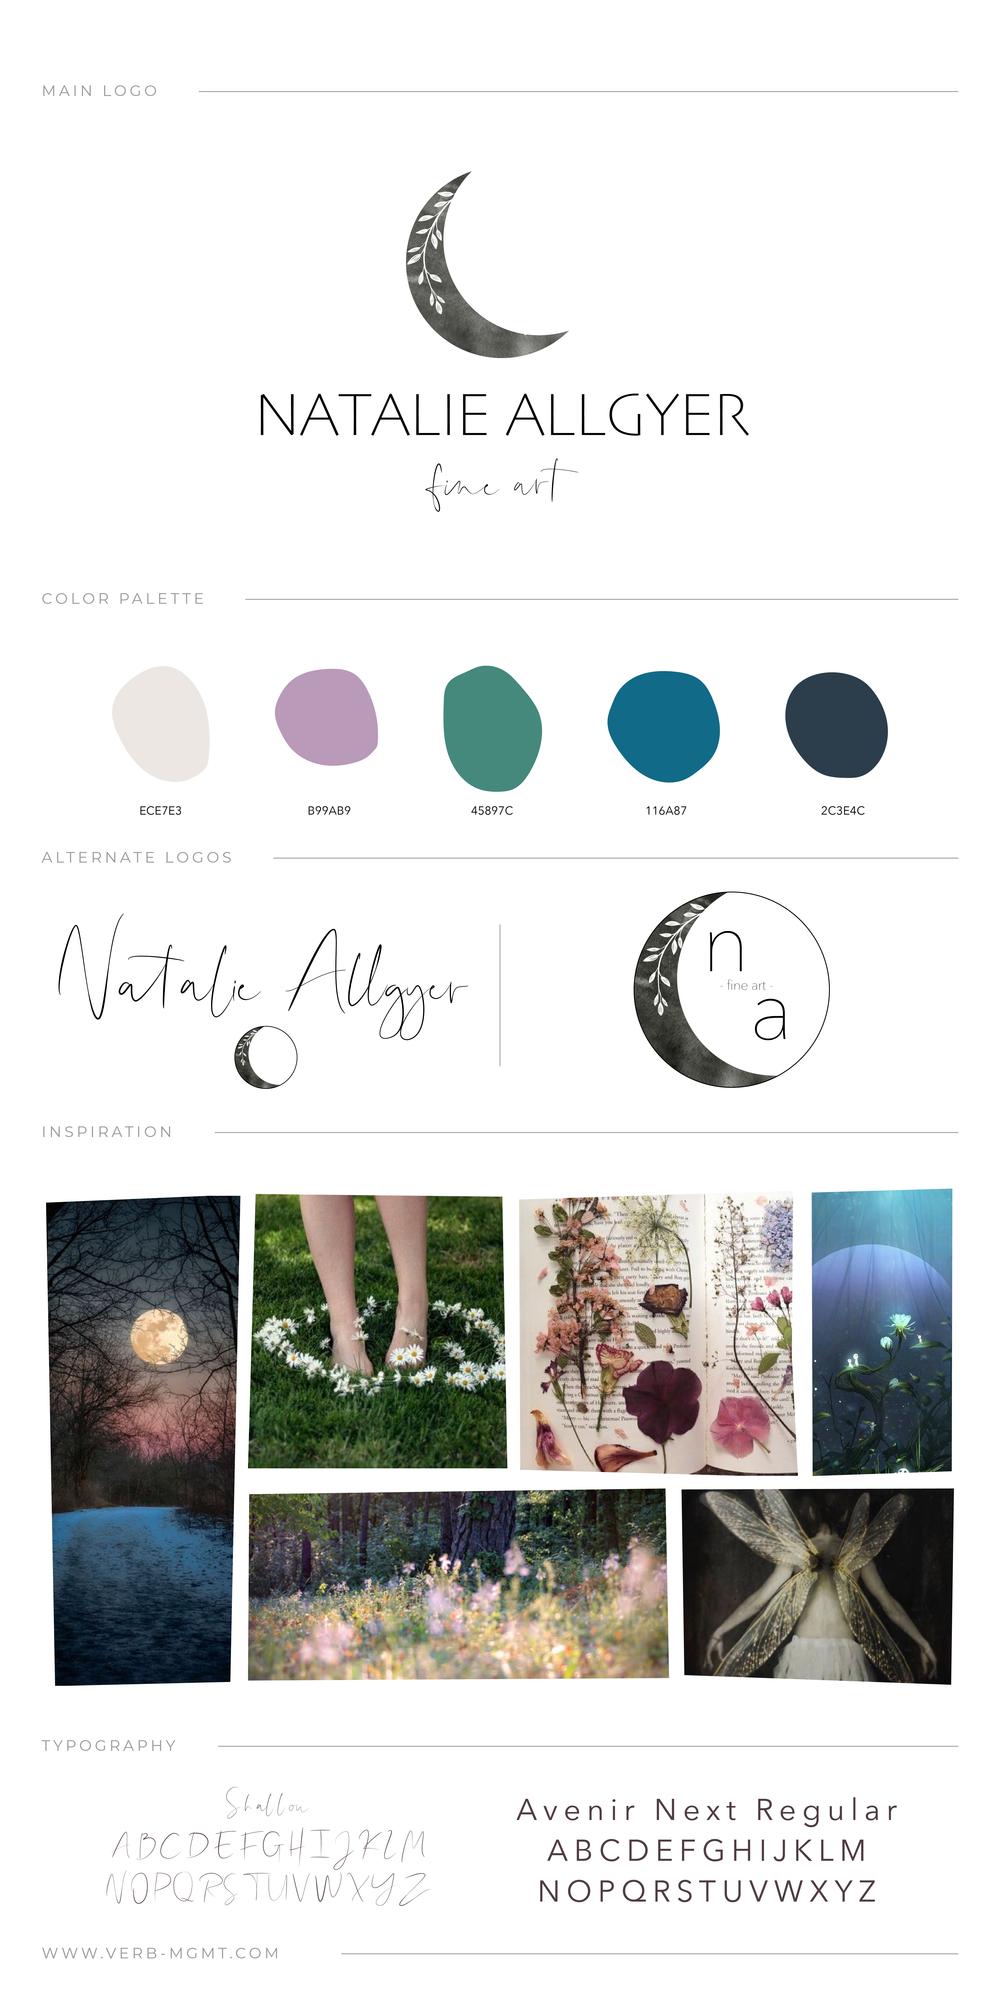 mood-board-brand-branding-art-charleston-photography-natalie-allgyer-artist-design-verb-mgmt-management